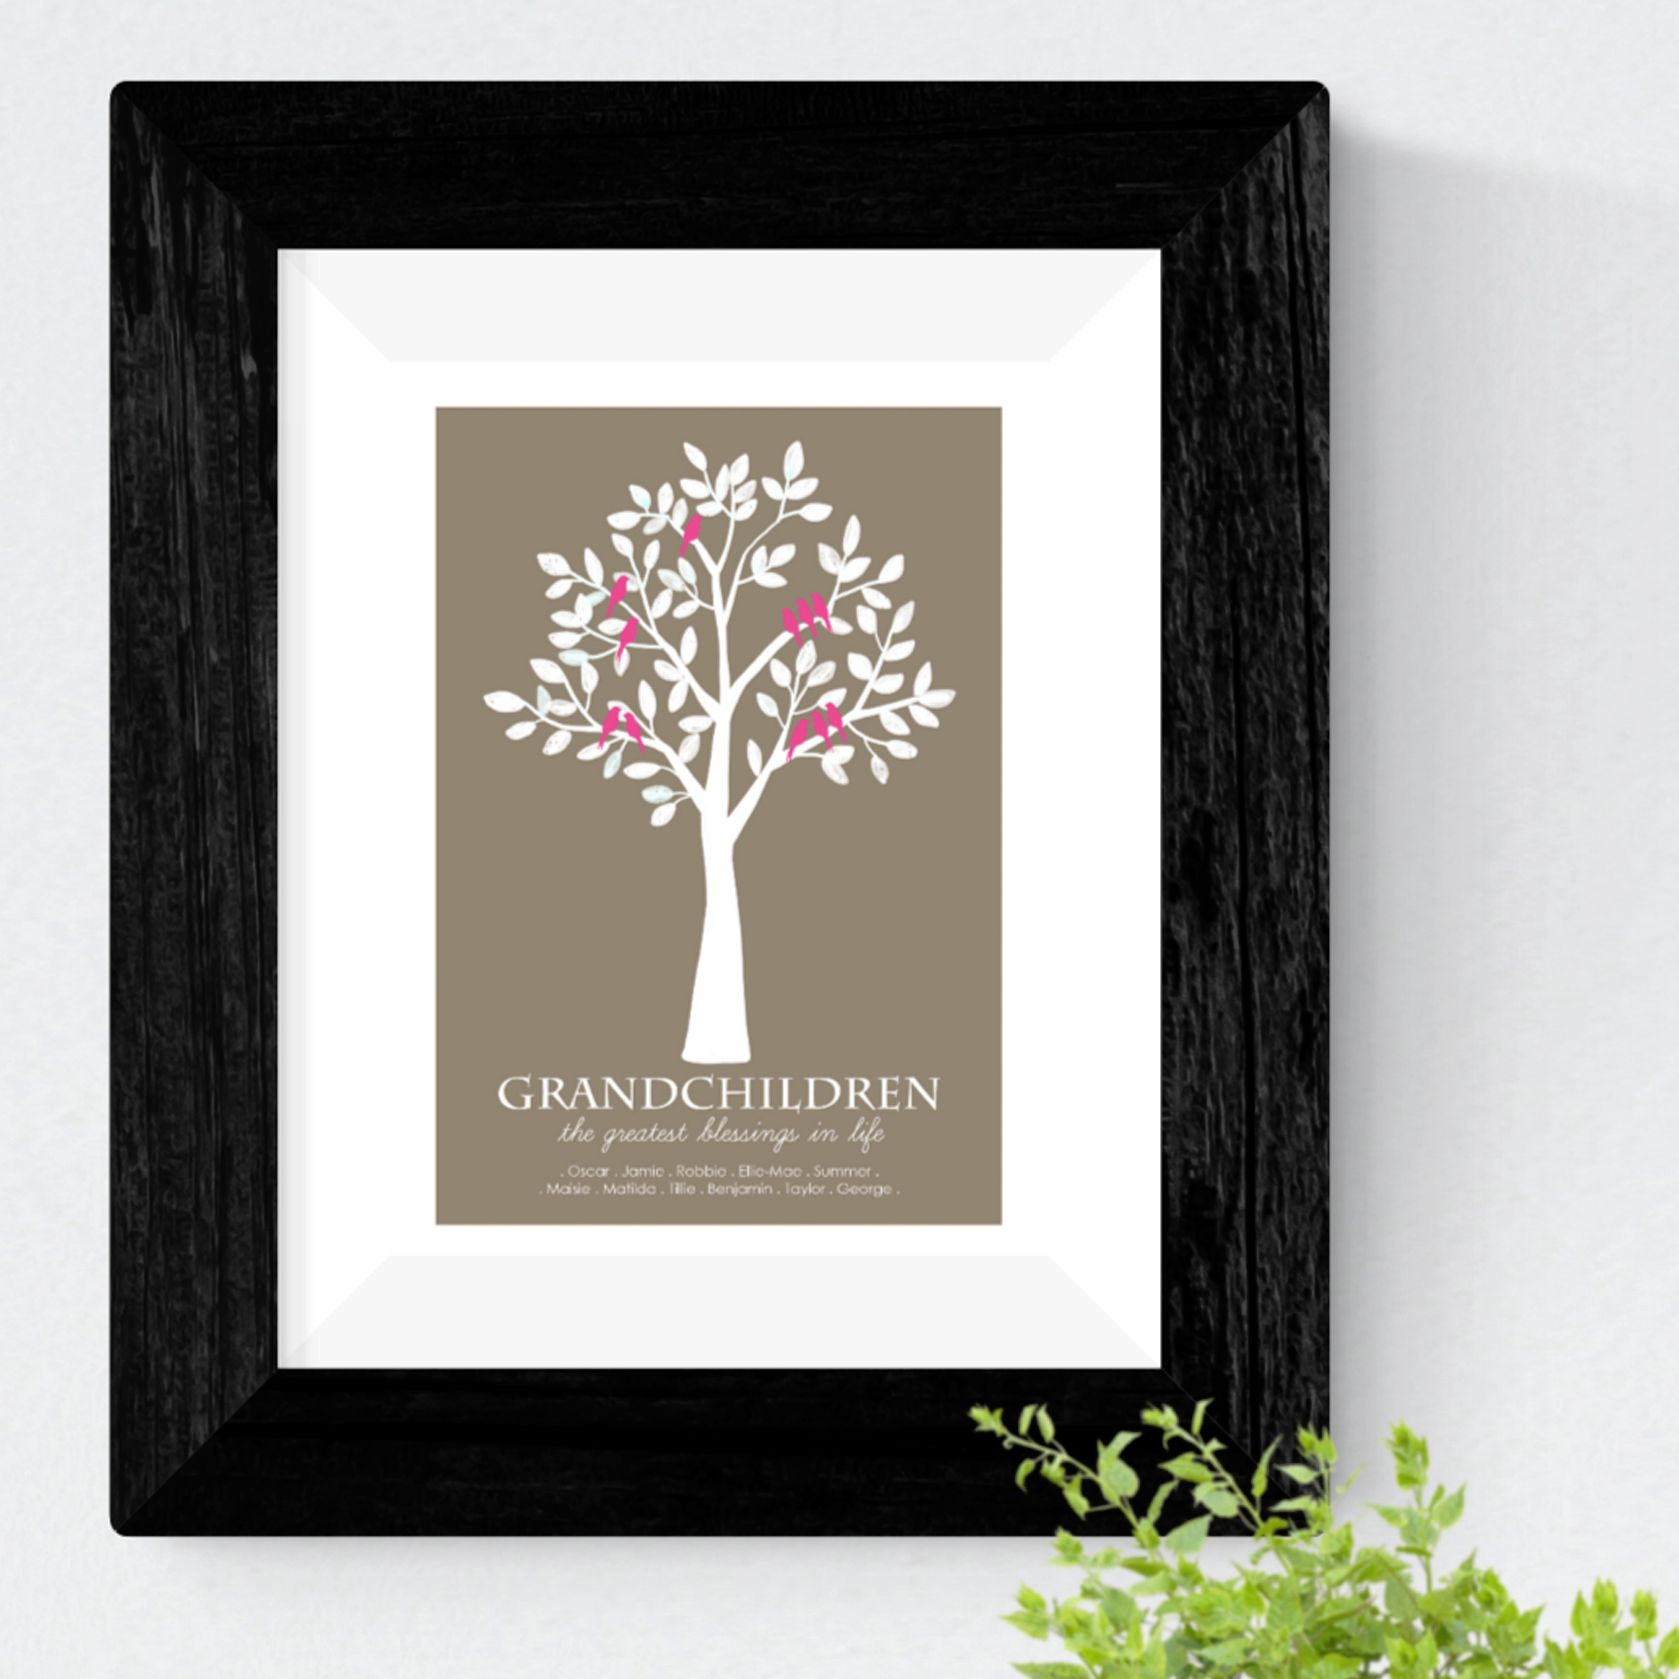 Grandchildren Family personalised gift idea